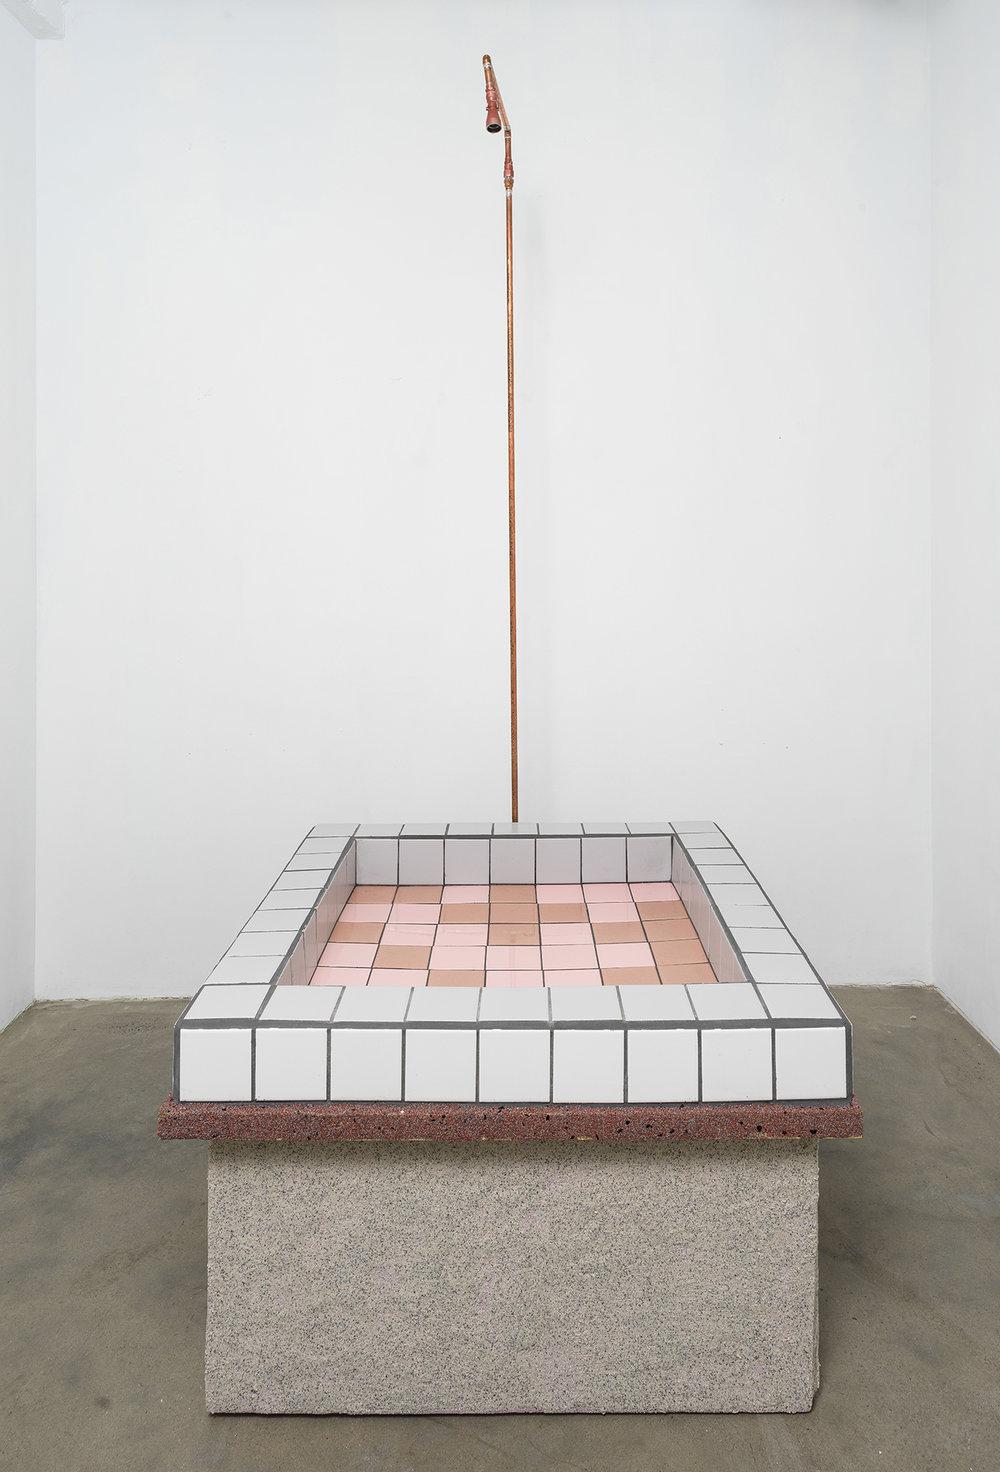 Rachel Higgins, Public Fountain, 2018